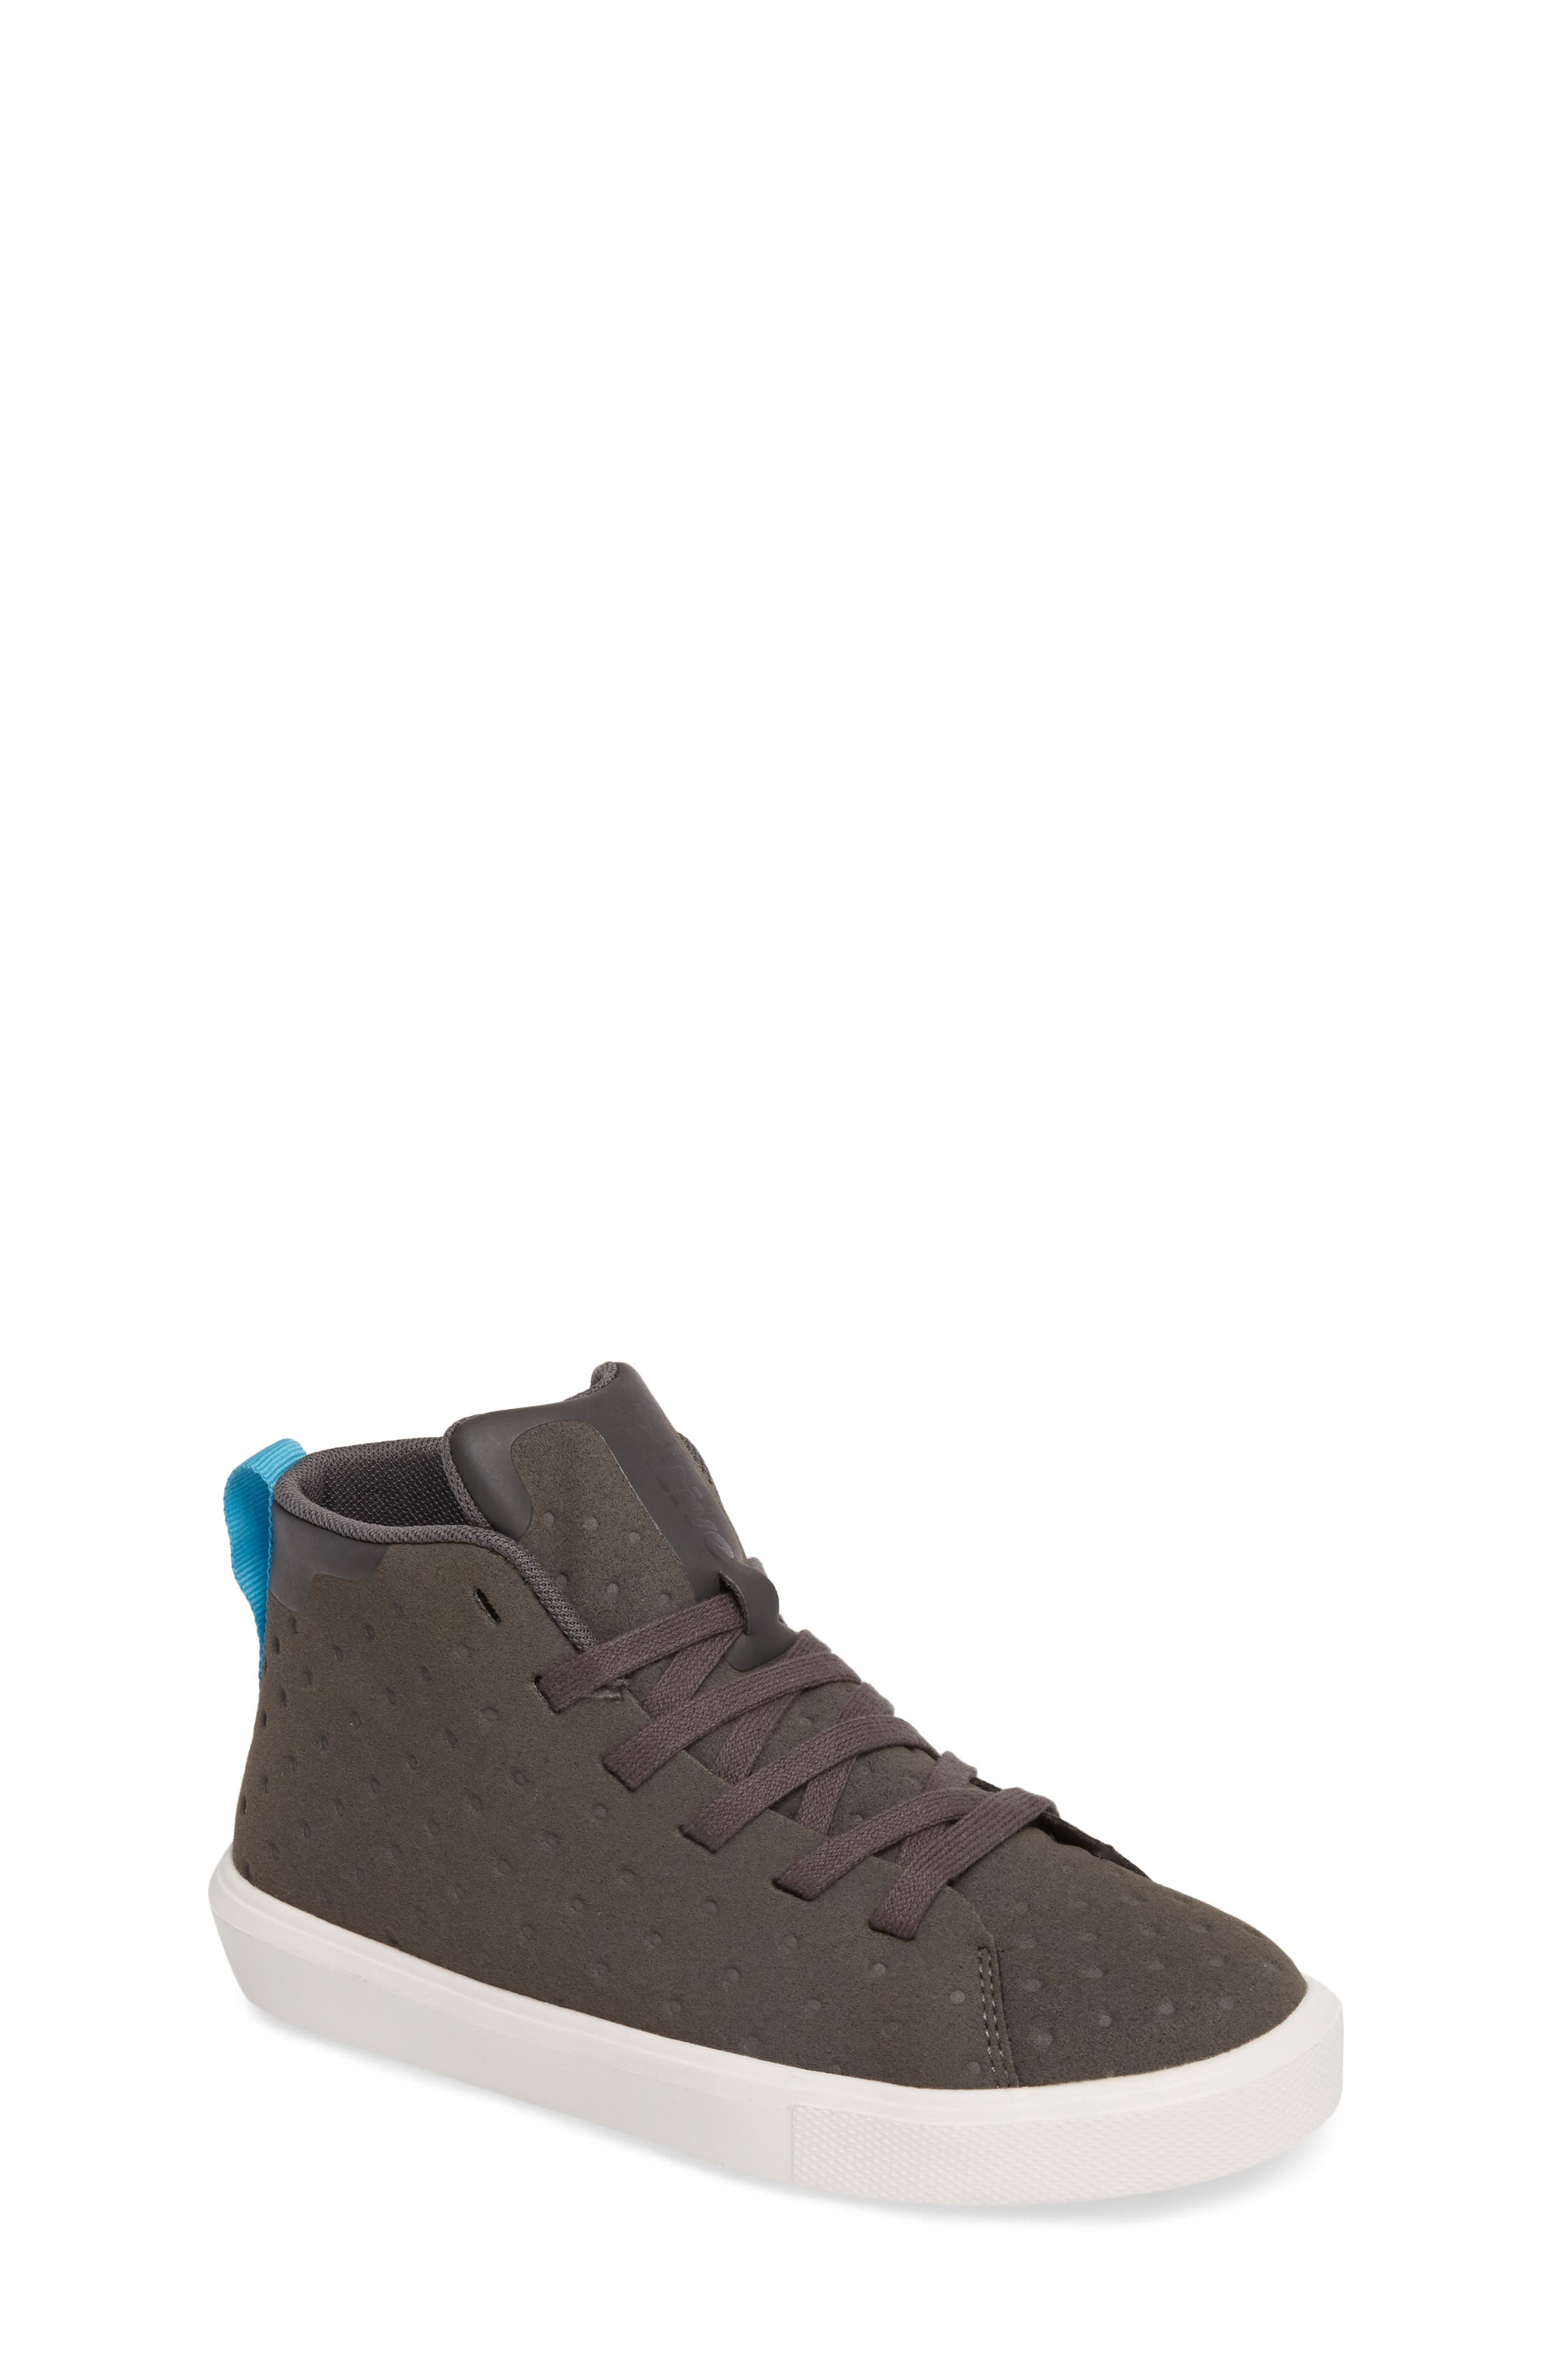 Native Monaco Sneaker,                         Main,                         color, 024